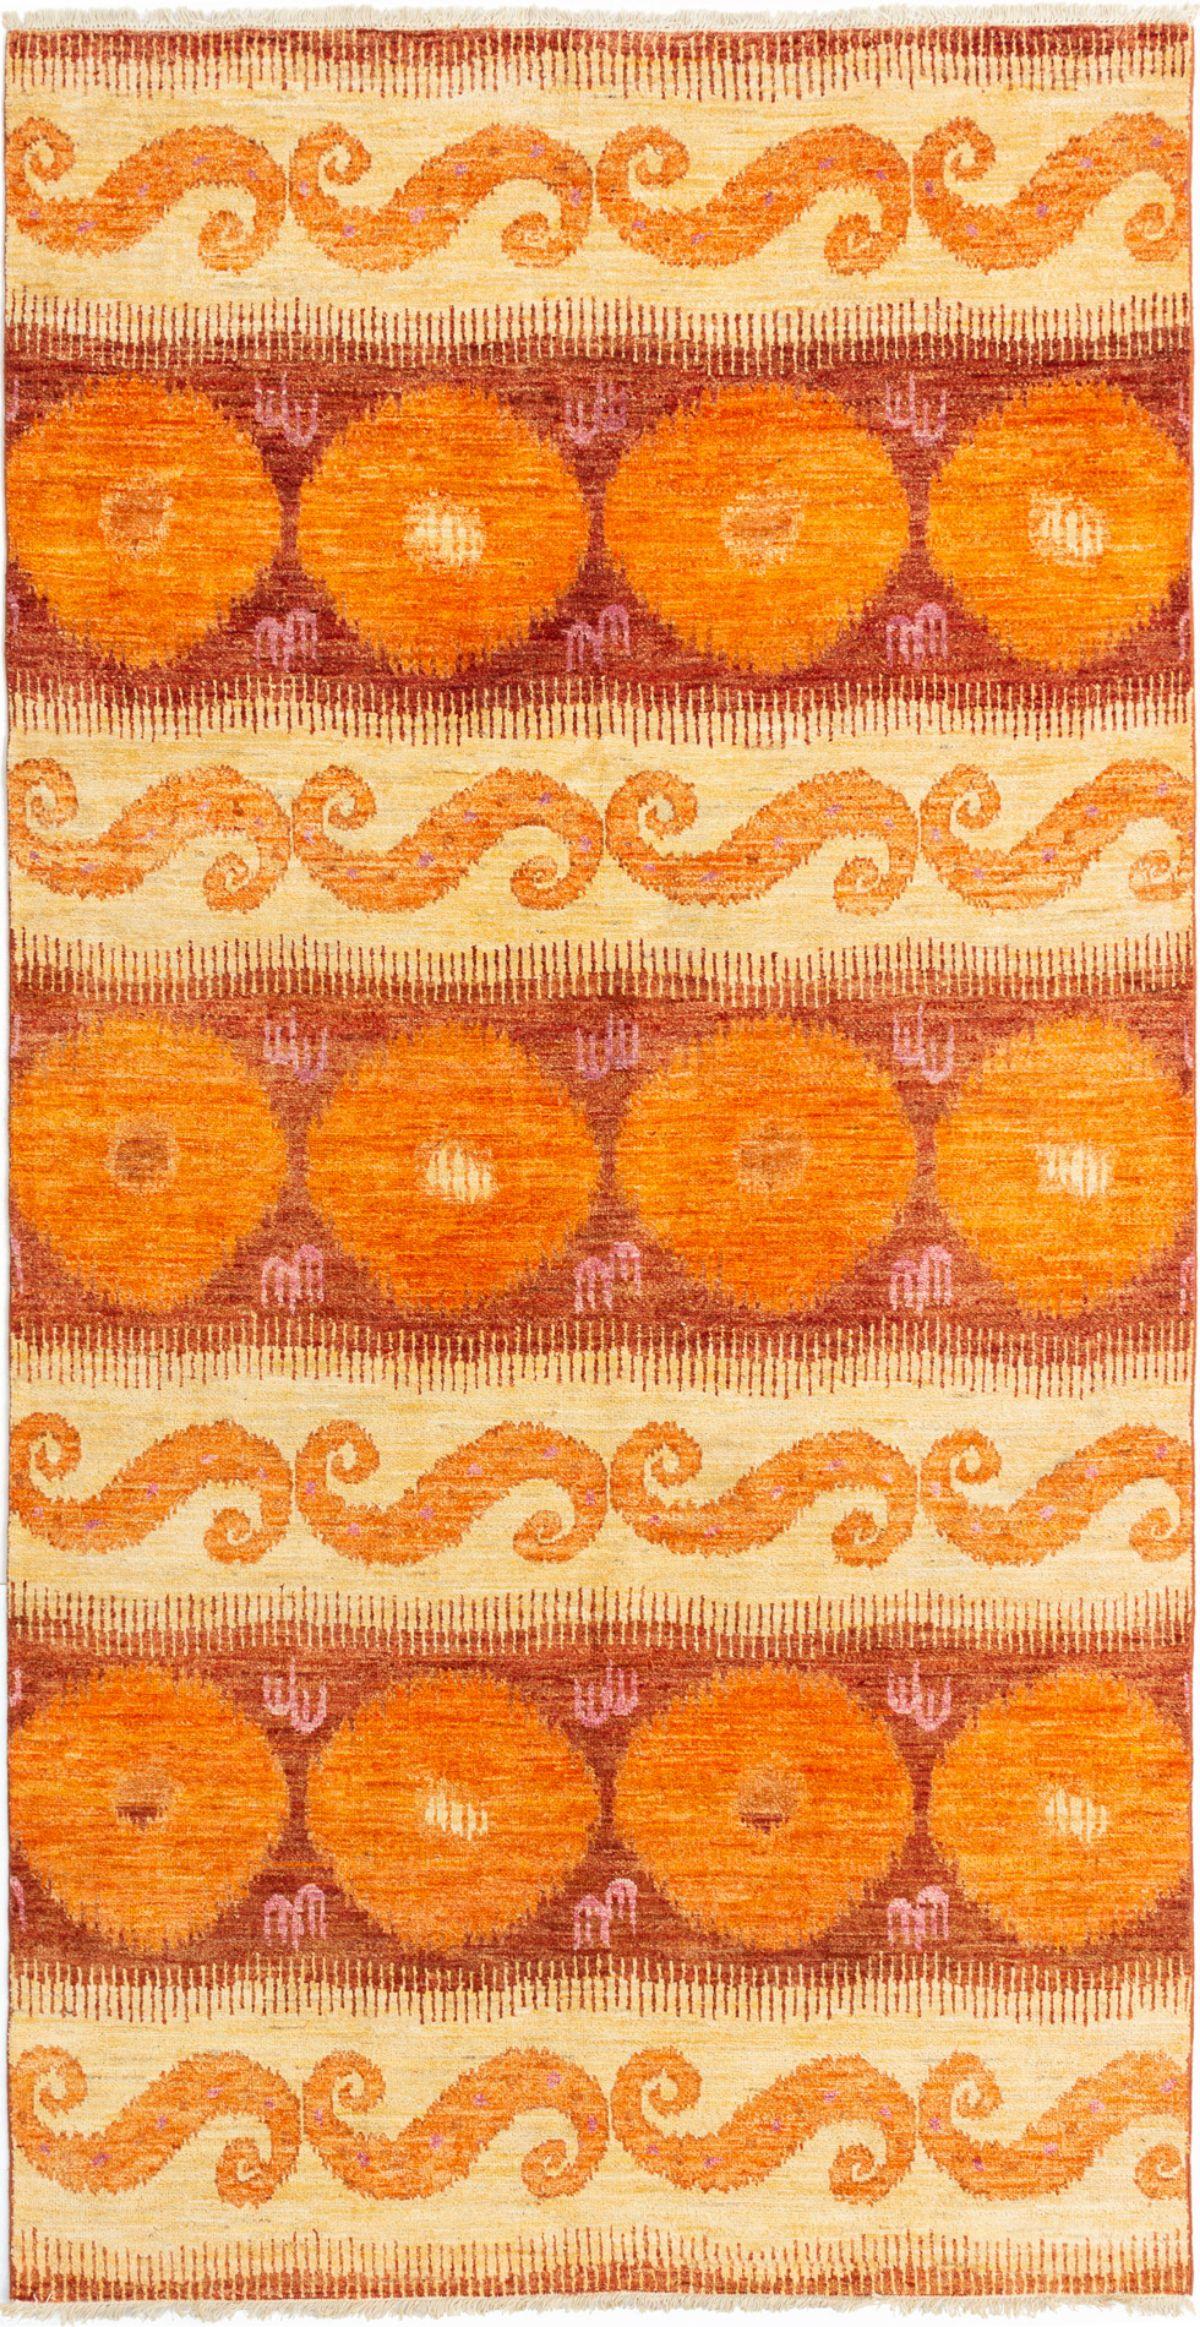 "Hand-knotted Shalimar Orange Wool Rug 6'0"" x 11'6"" Size: 6'0"" x 11'6"""